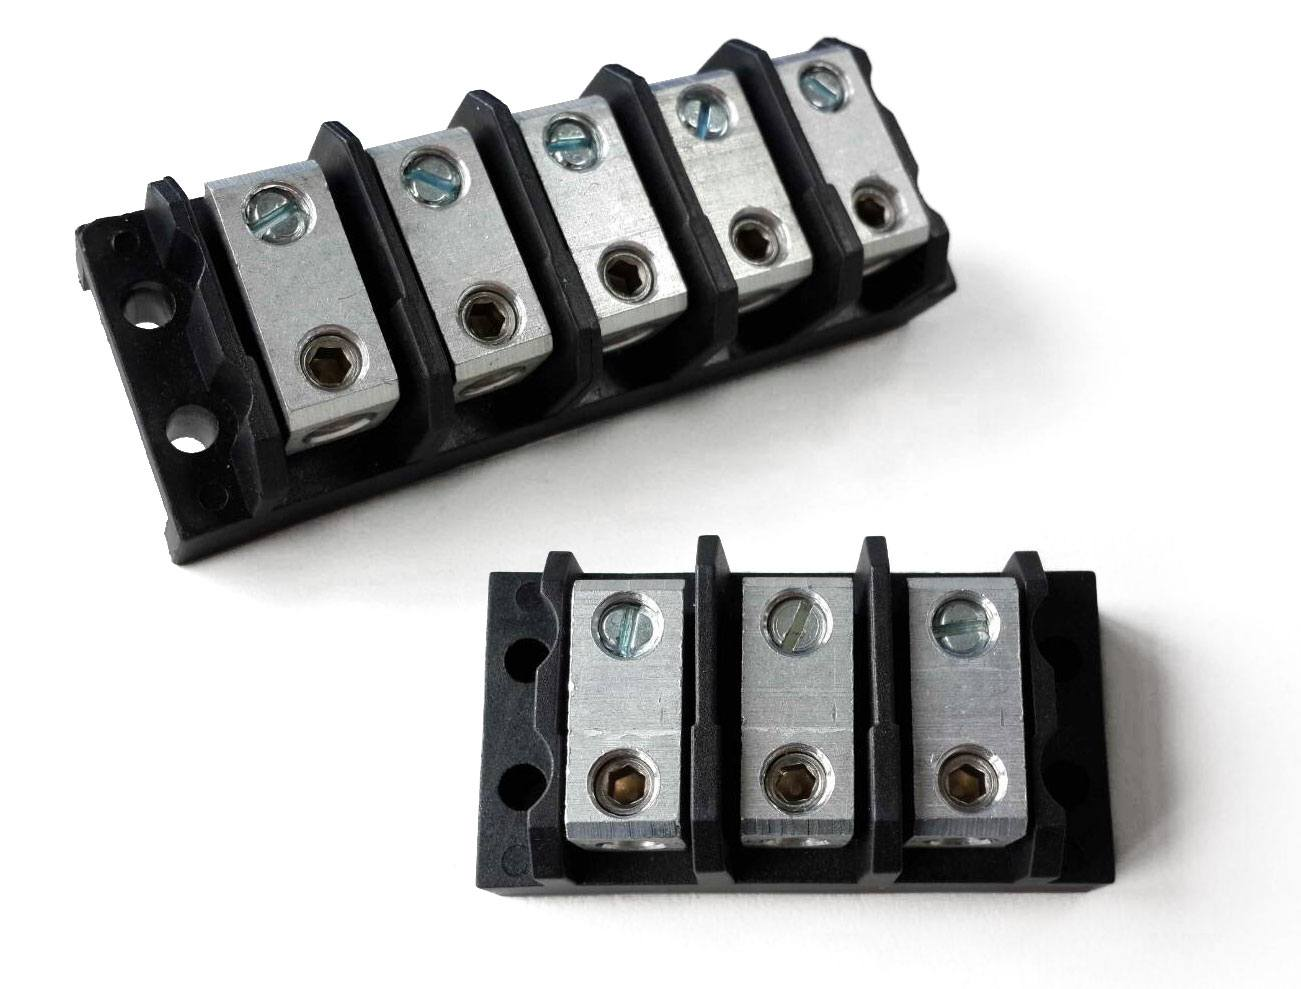 Power Terminal Block : Tgp xxbhs electrical power splicer terminal blocks